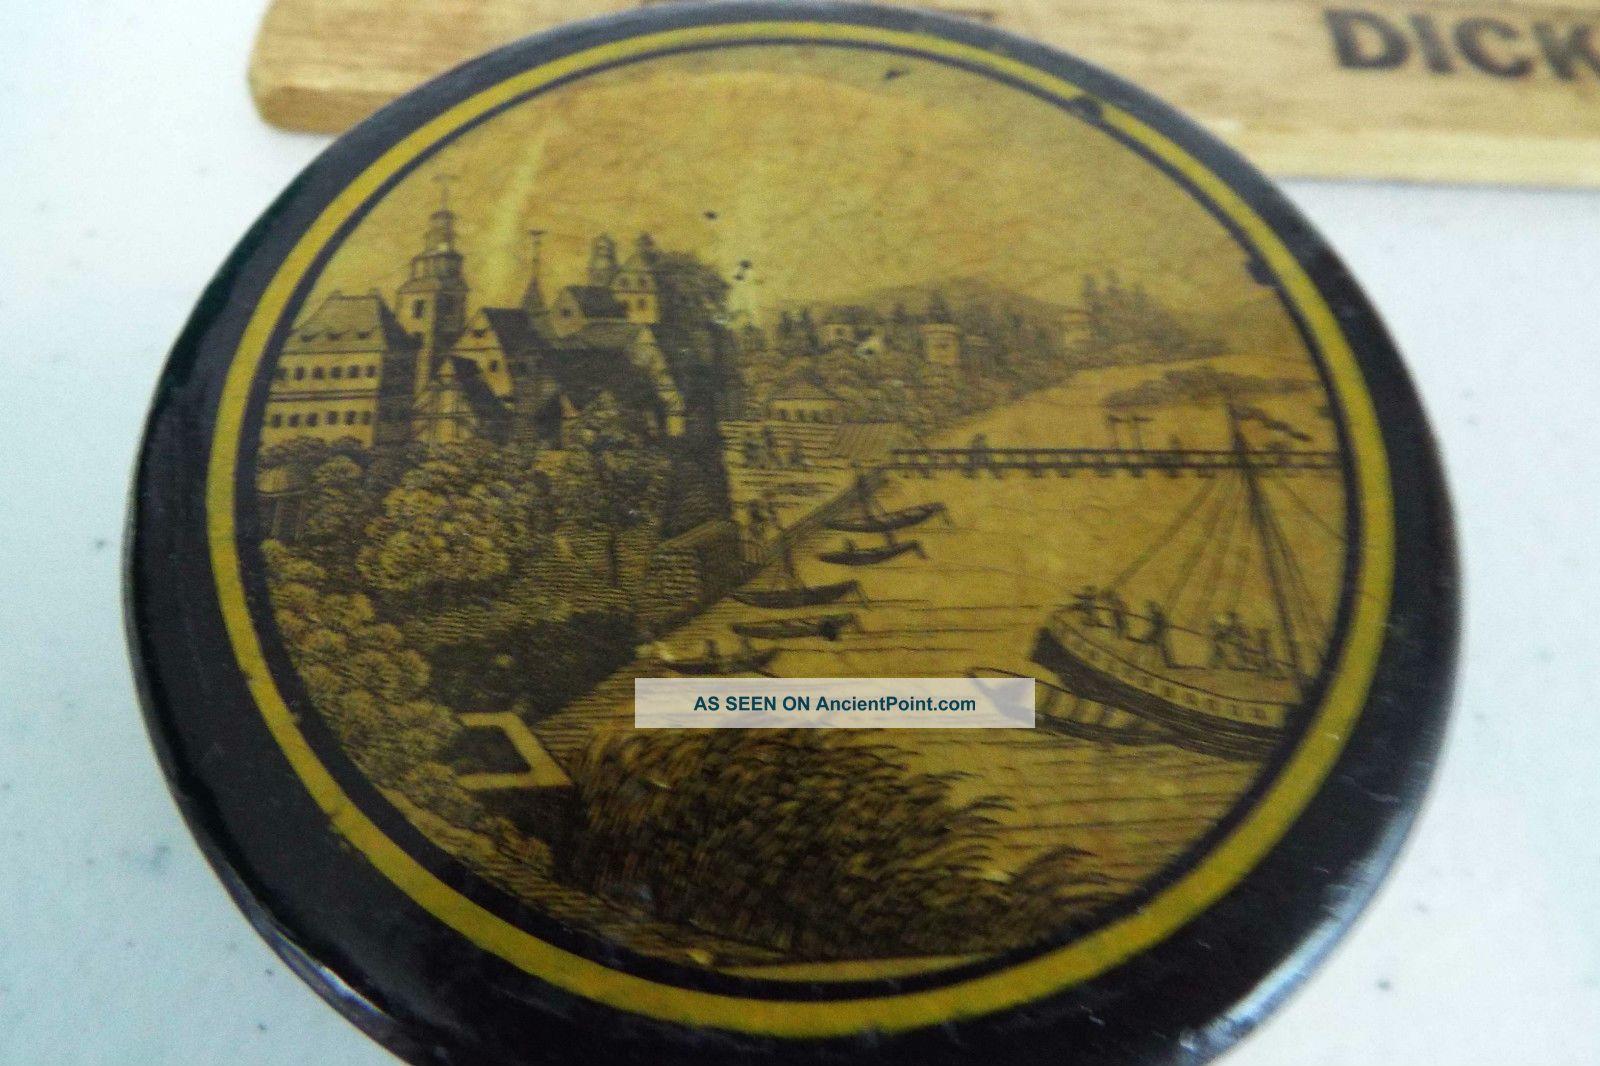 Antique Port Ship Snuff Box Coastal Europe Or The Americas Trivets photo